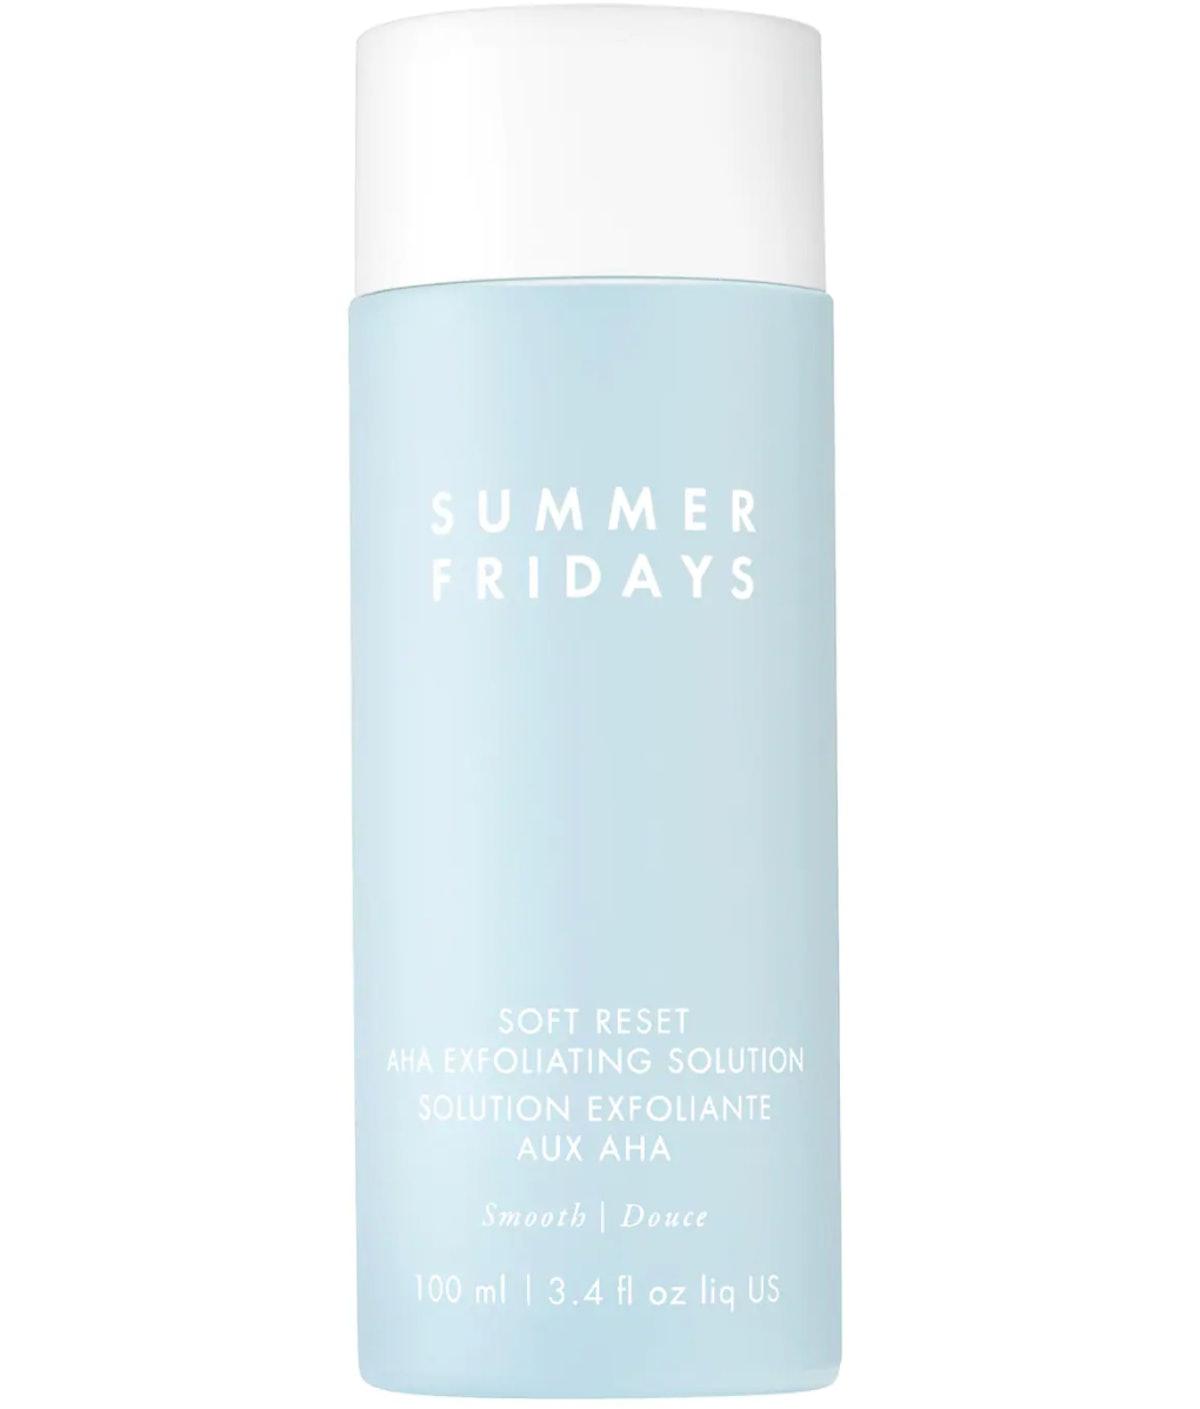 Summer Fridays Soft Reset AHA Exfoliating Solution